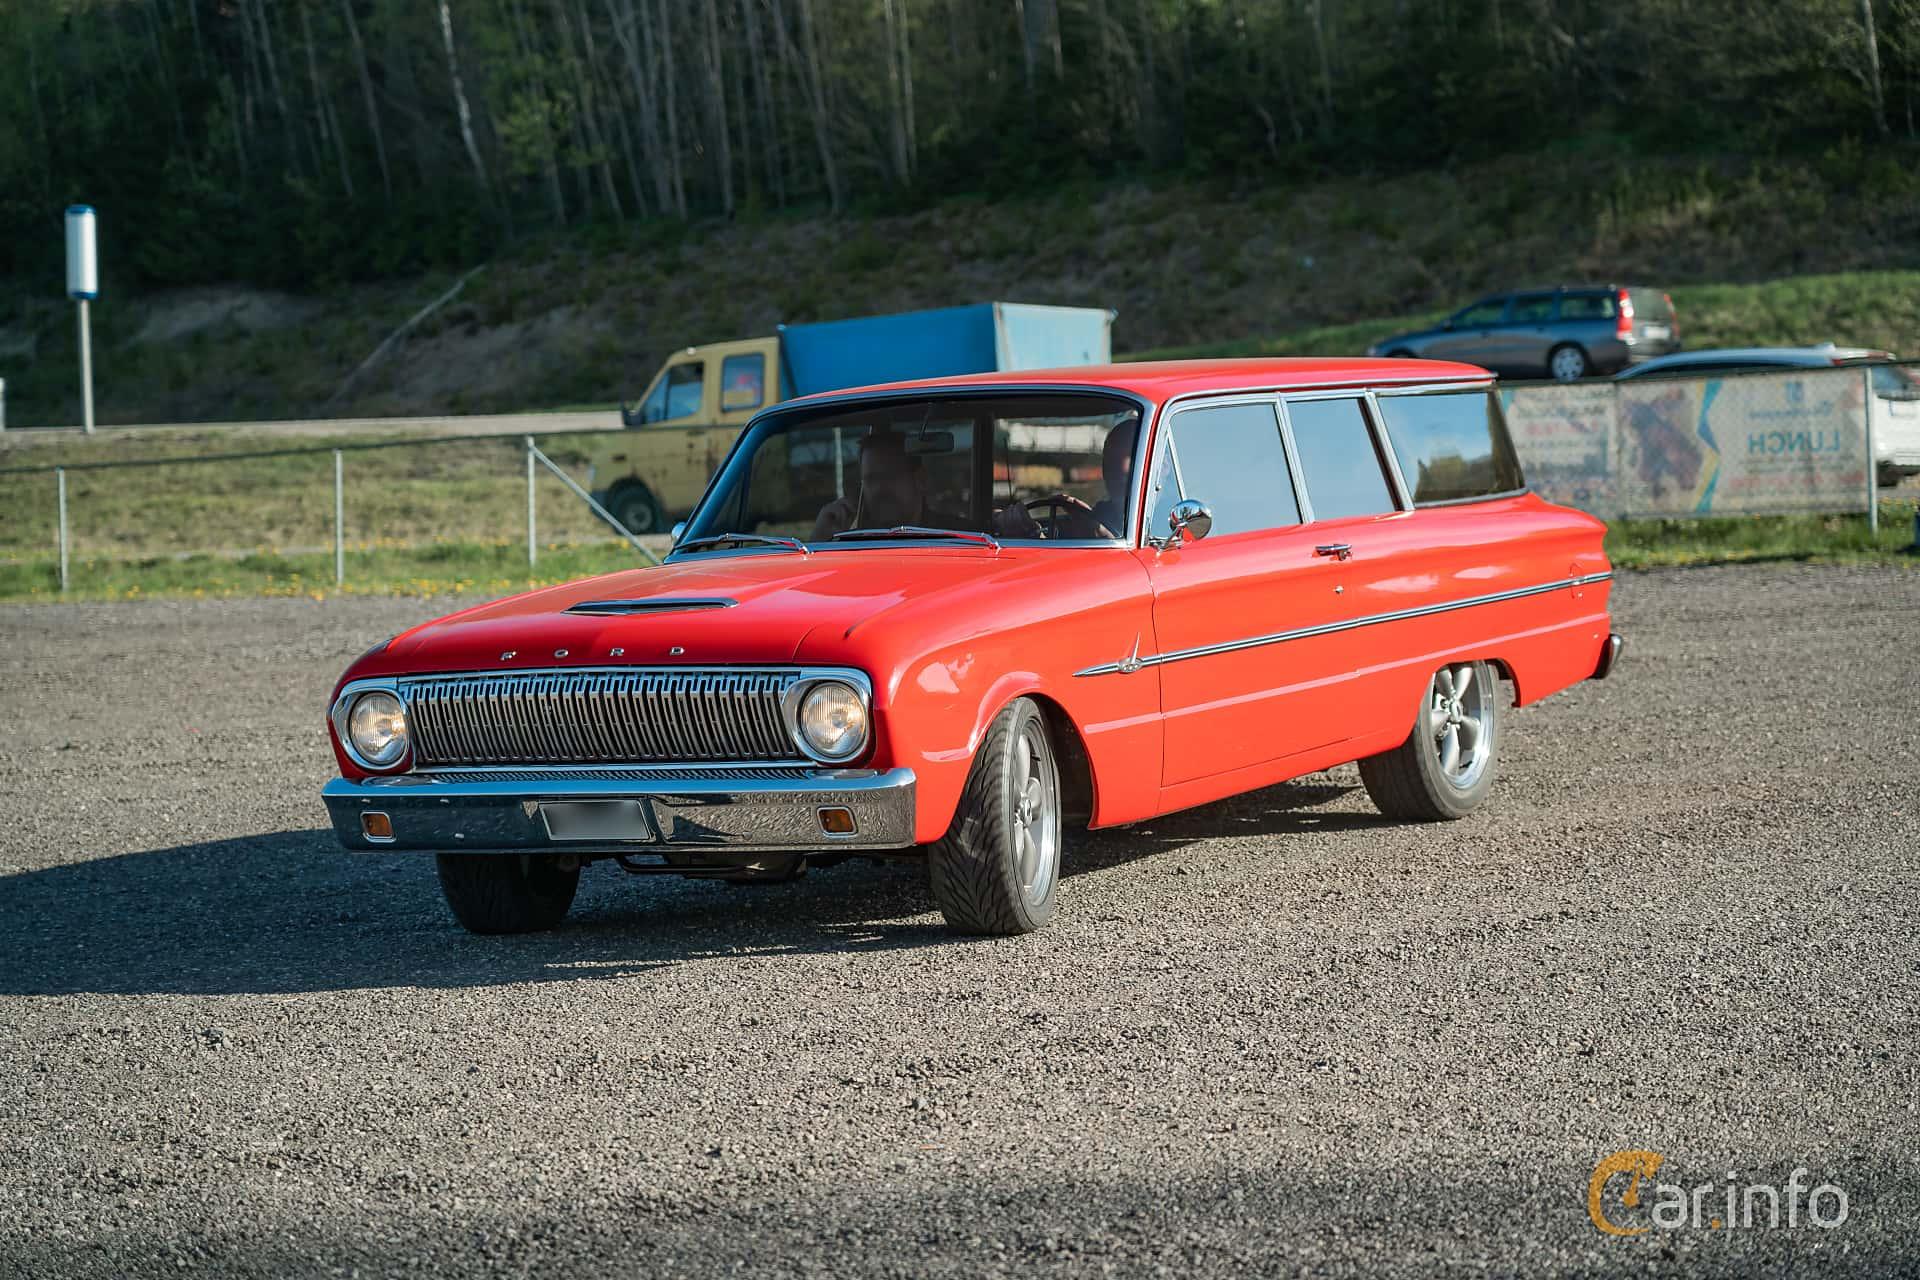 Ford Falcon 2-door Station Wagon 2.8 Automatic, 102hp, 1962 at Lissma Classic Car 2019 vecka 20